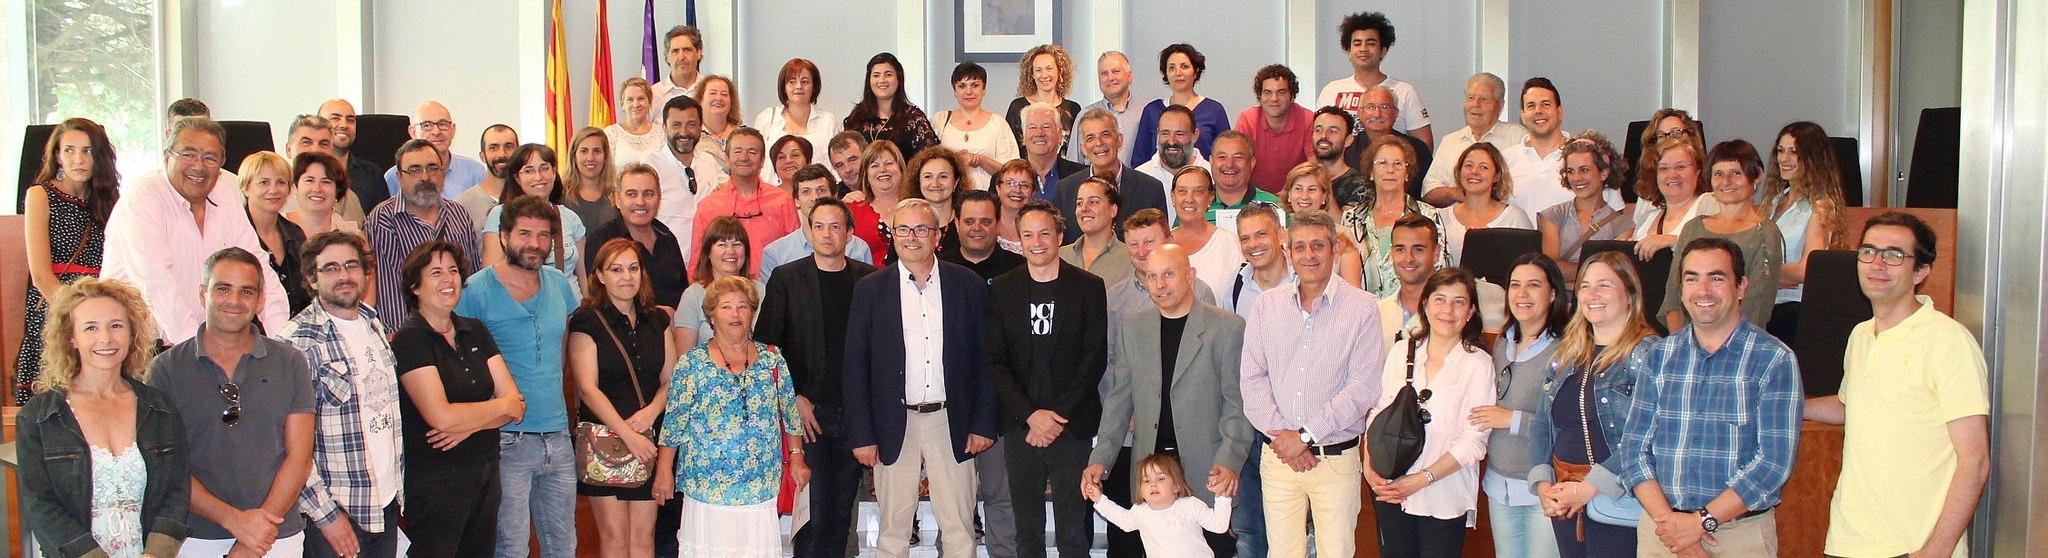 Clausura Jornadas gastronómicas Ibiza Sabor 2016